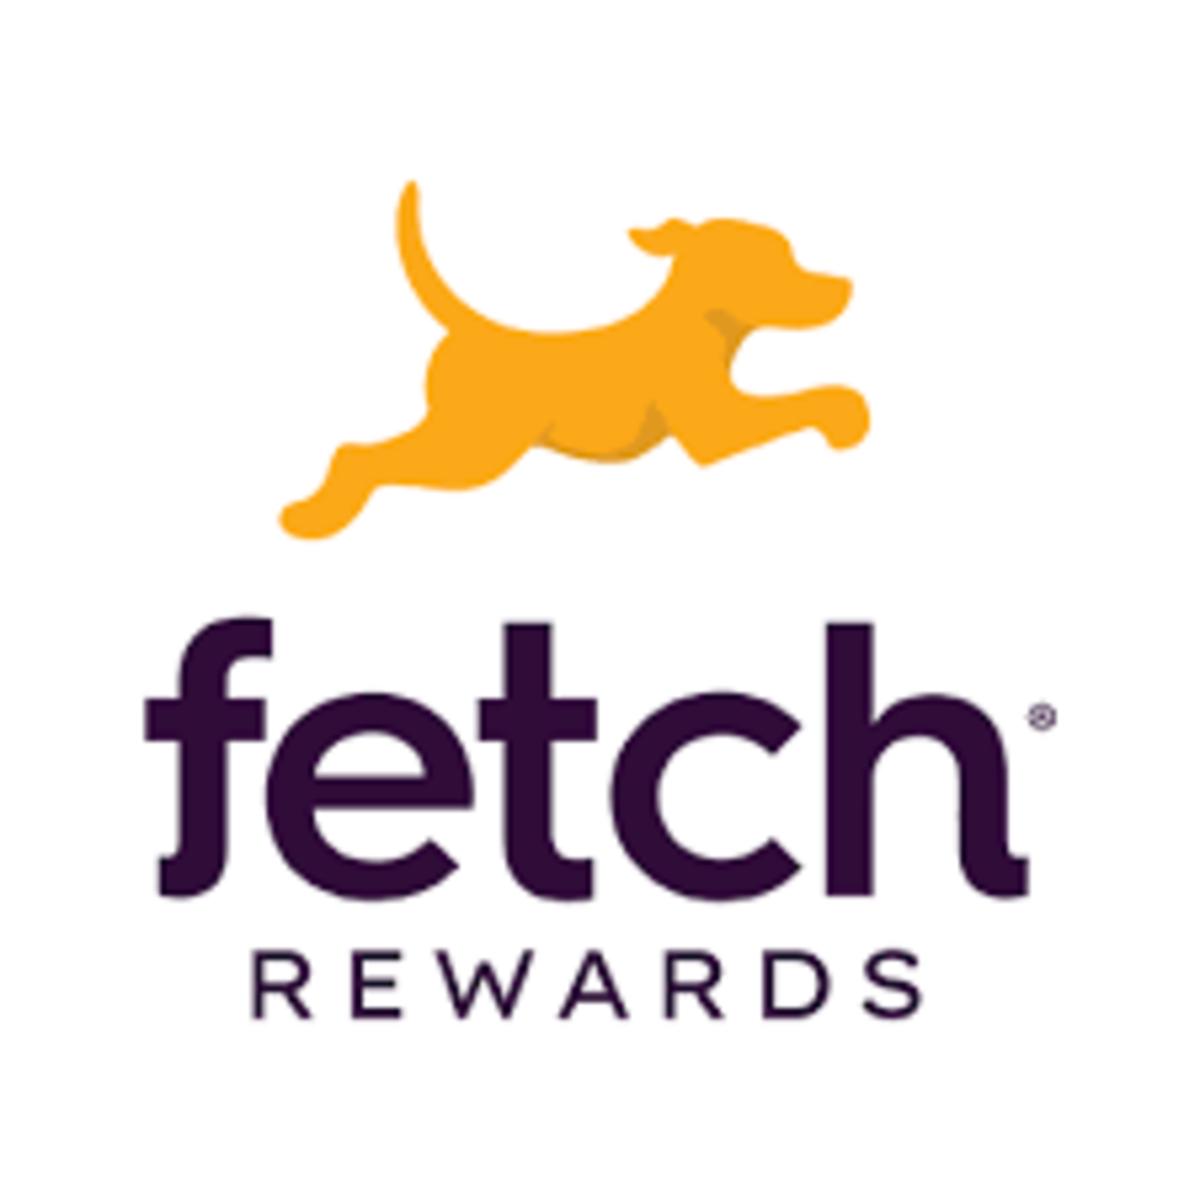 Fetch Rewards is a grocery money-maker